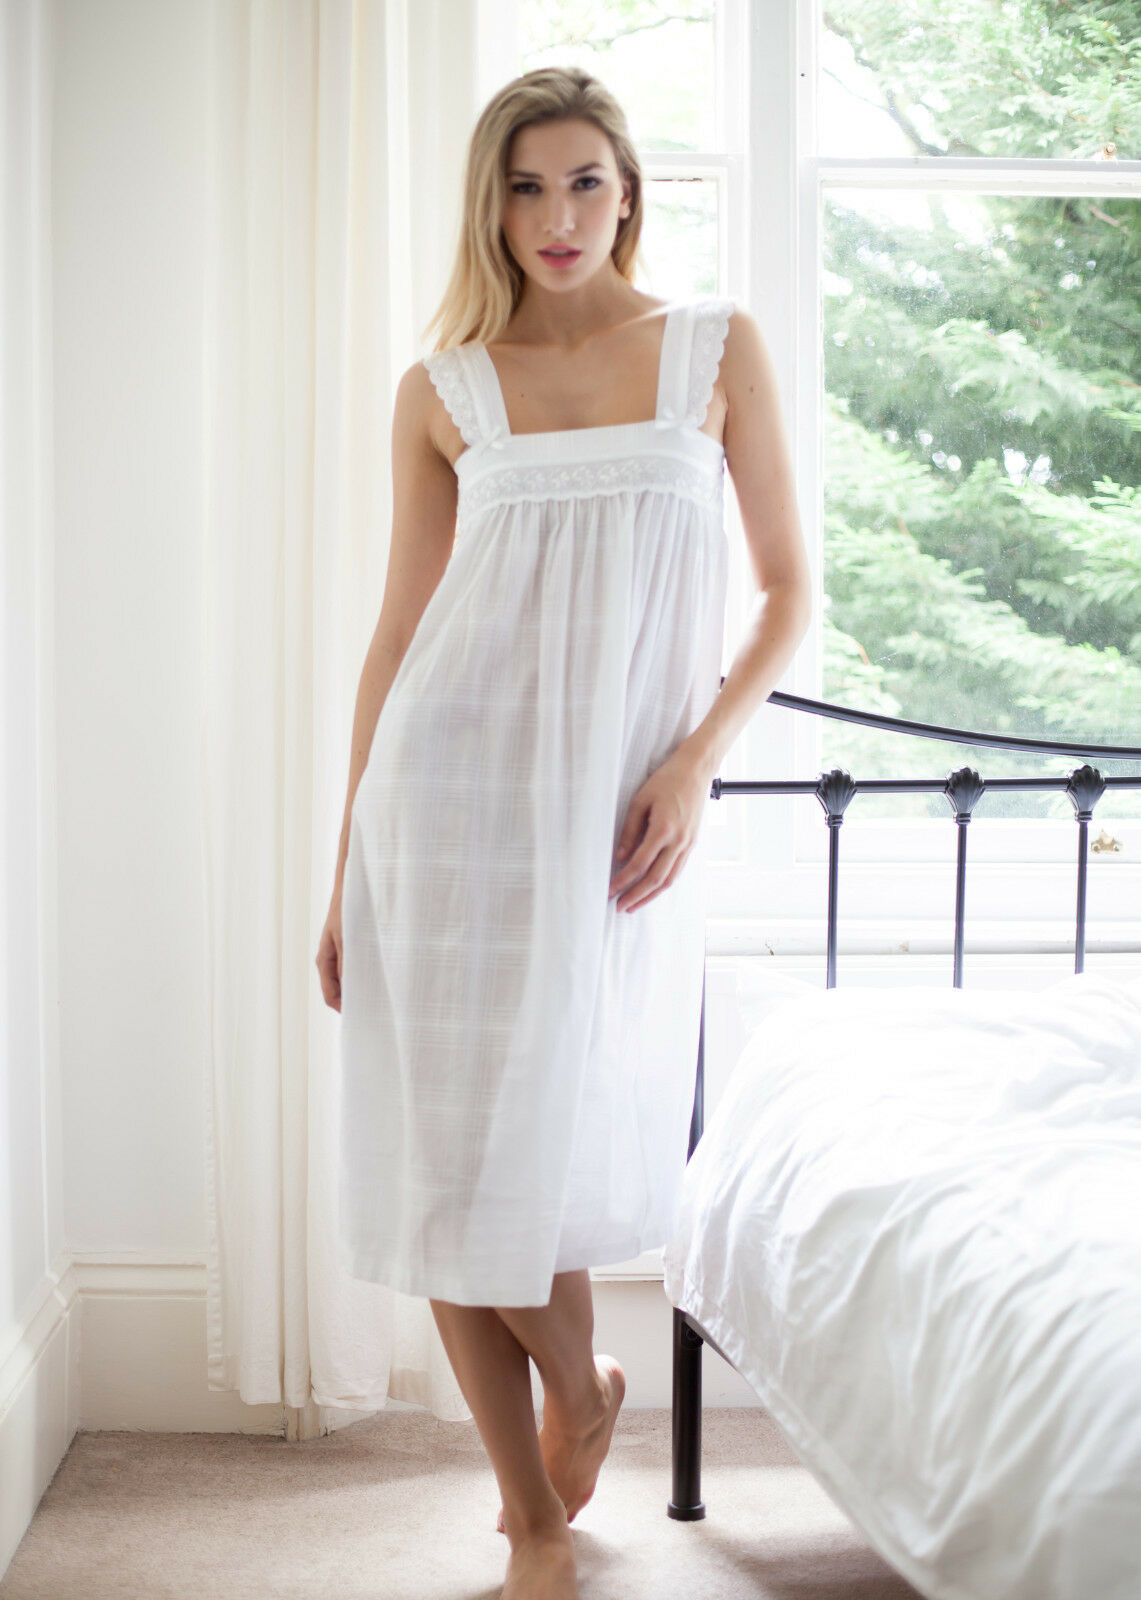 Cottonreal 'Nana' 100% Cotton Lawn Wide Shoulder Strap White Ladies Nightdress